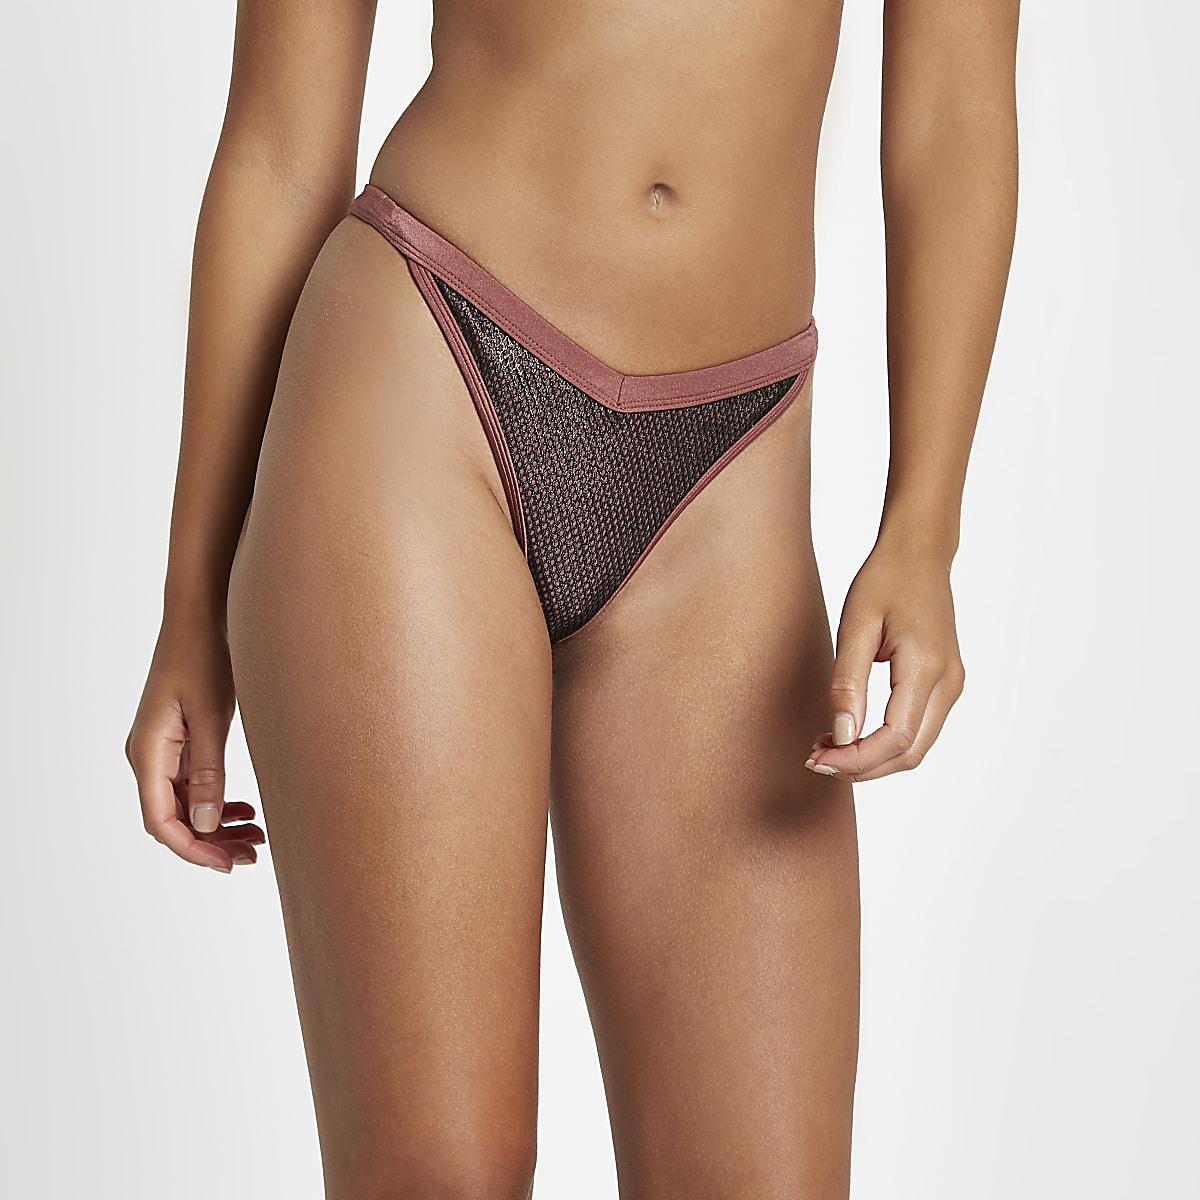 Donkerrood mesh hoog opgesneden bikinibroekje